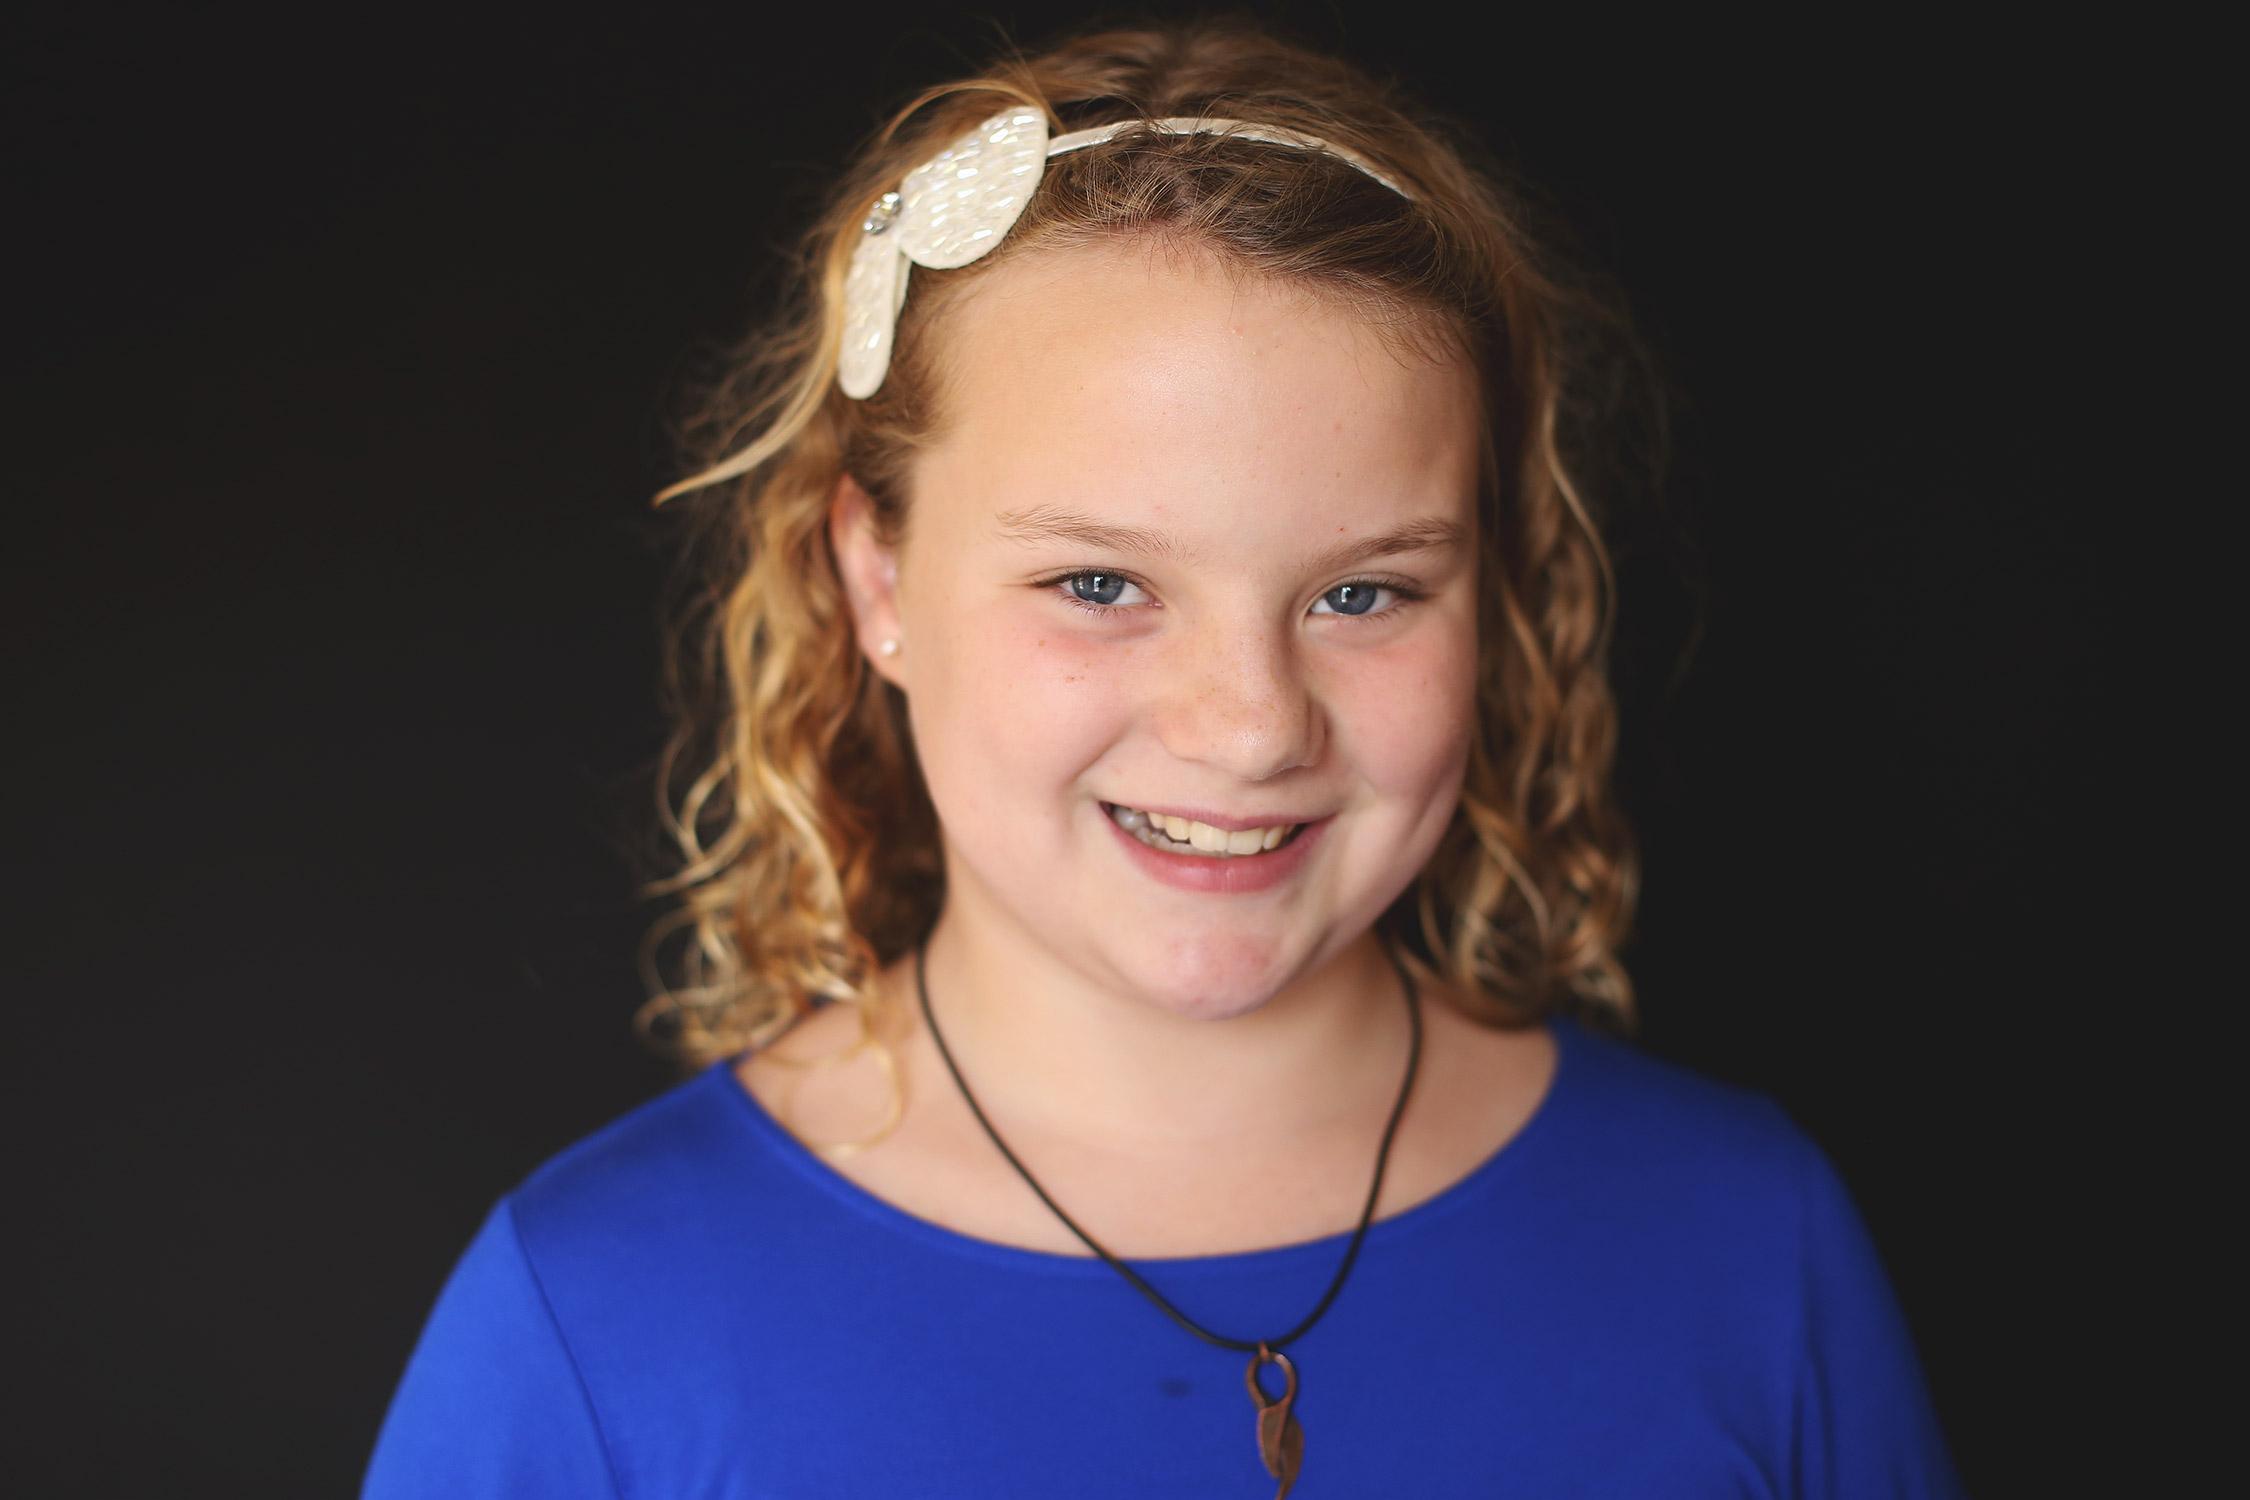 Tween girl smiling at camera   St. Louis School Pictures